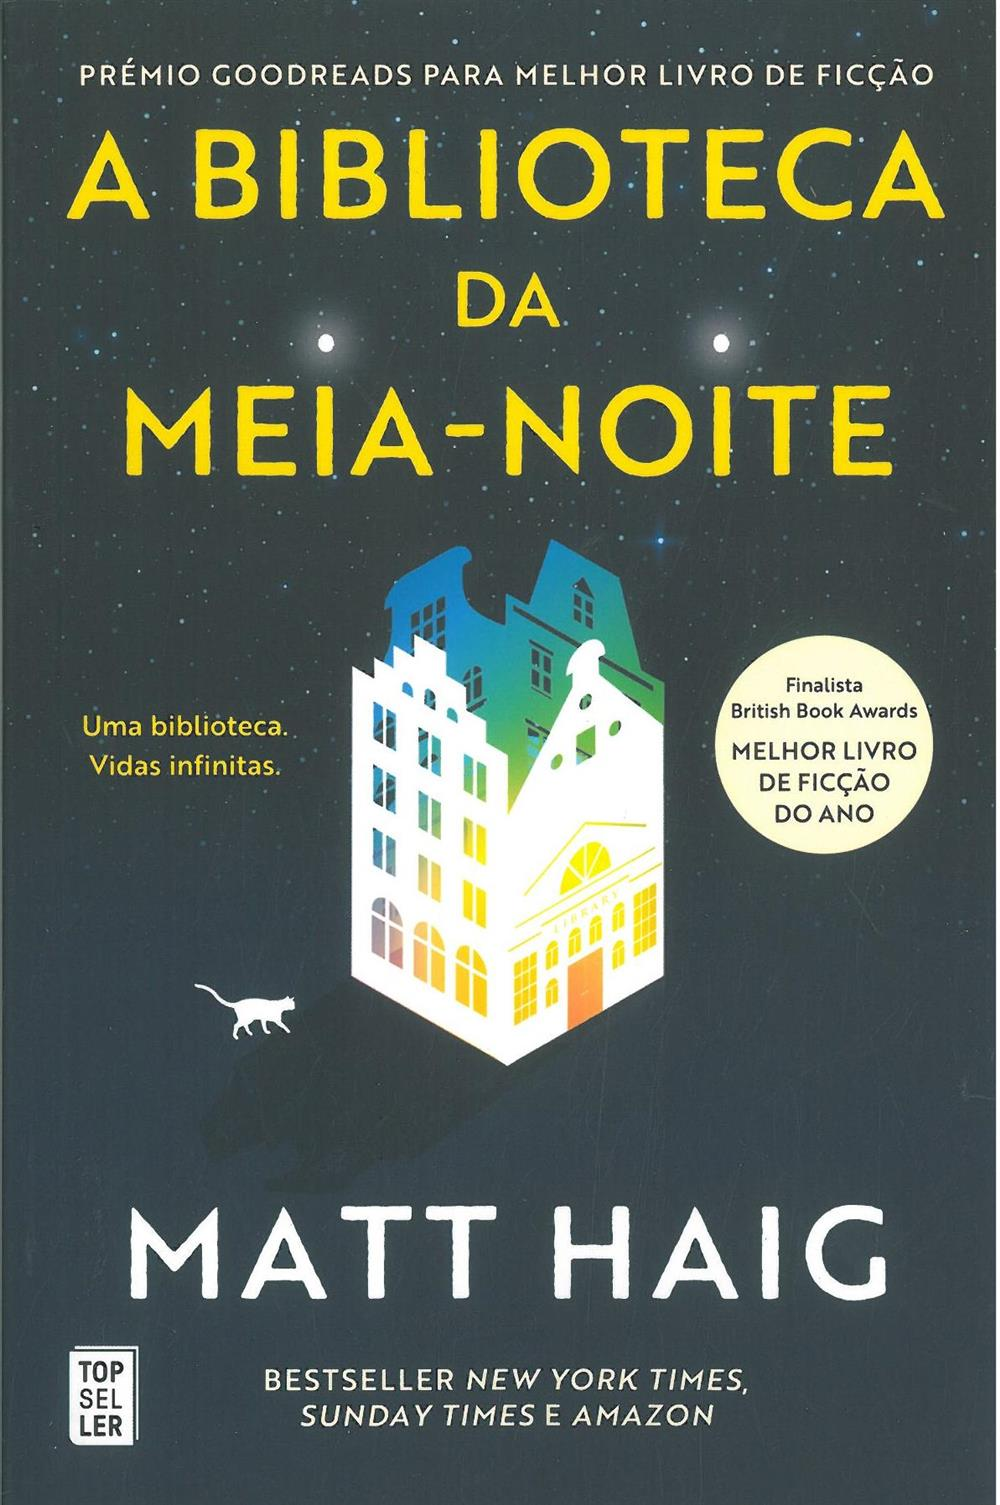 HAIG, Matt (2021). A biblioteca da meia noite.jpg